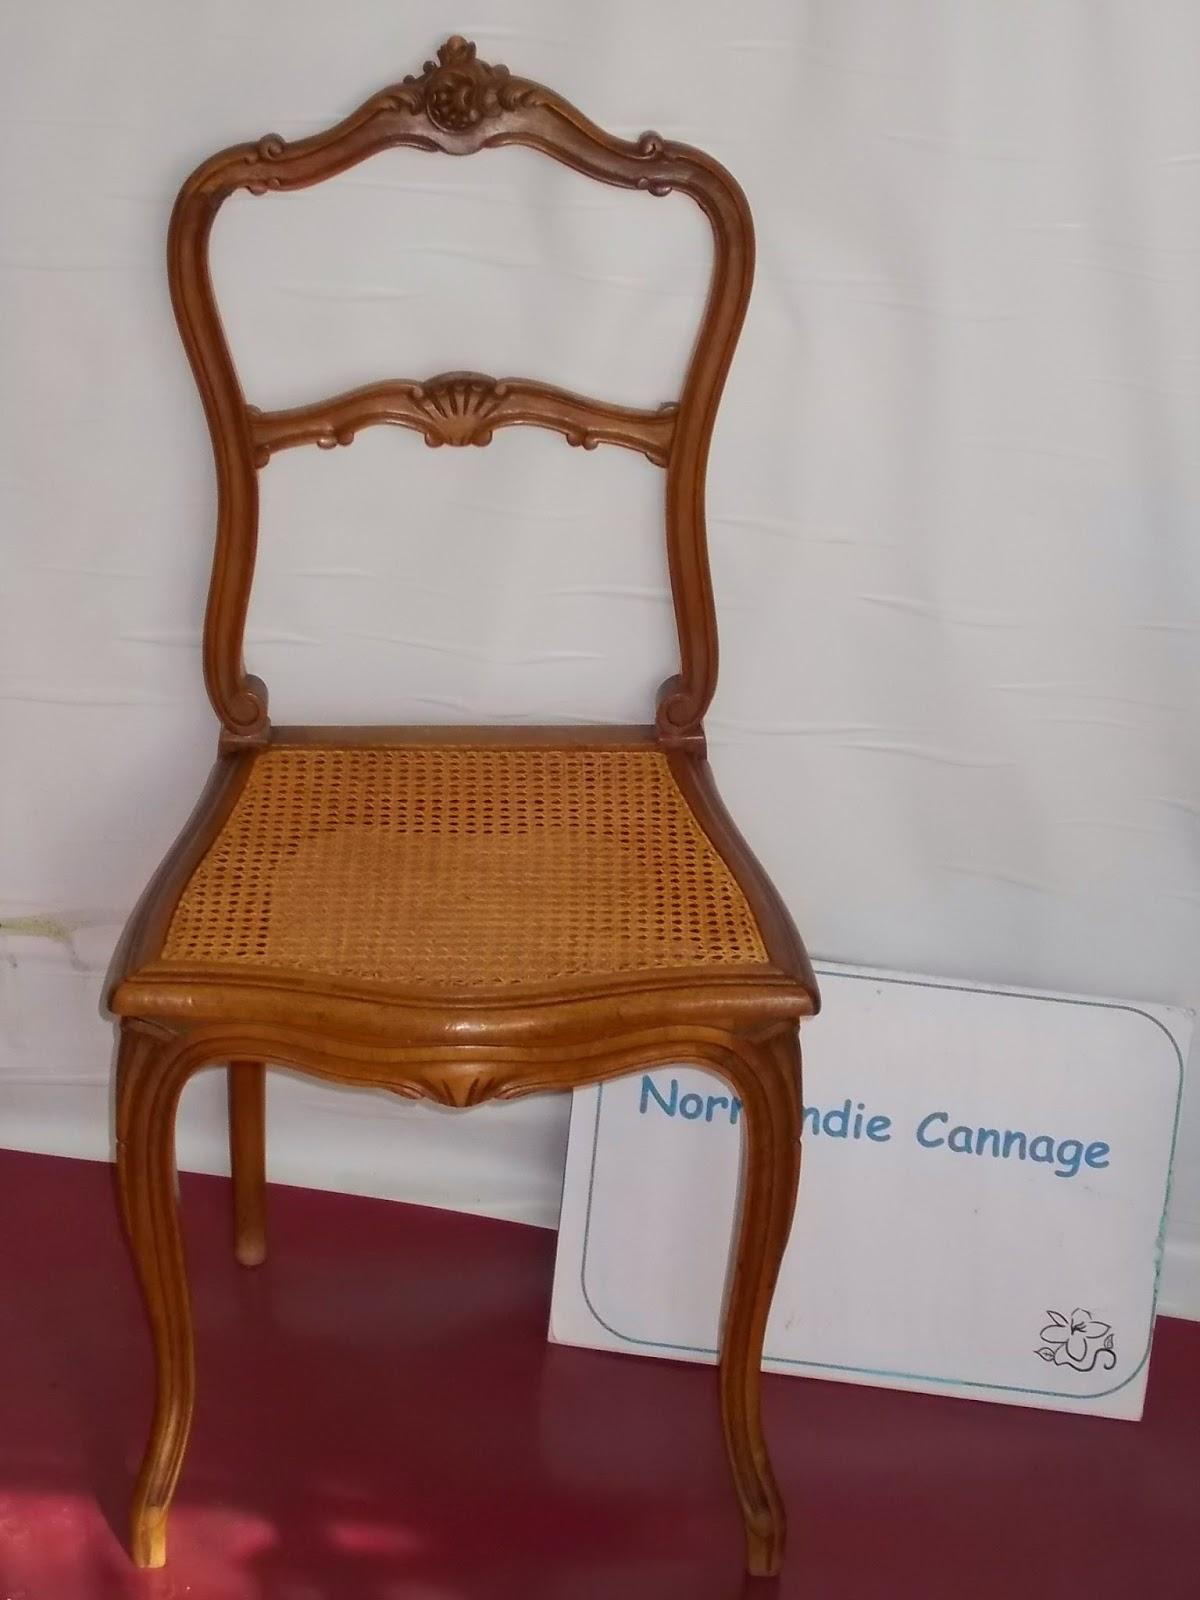 cannage rempaillage chaise tarif prix 2011. Black Bedroom Furniture Sets. Home Design Ideas